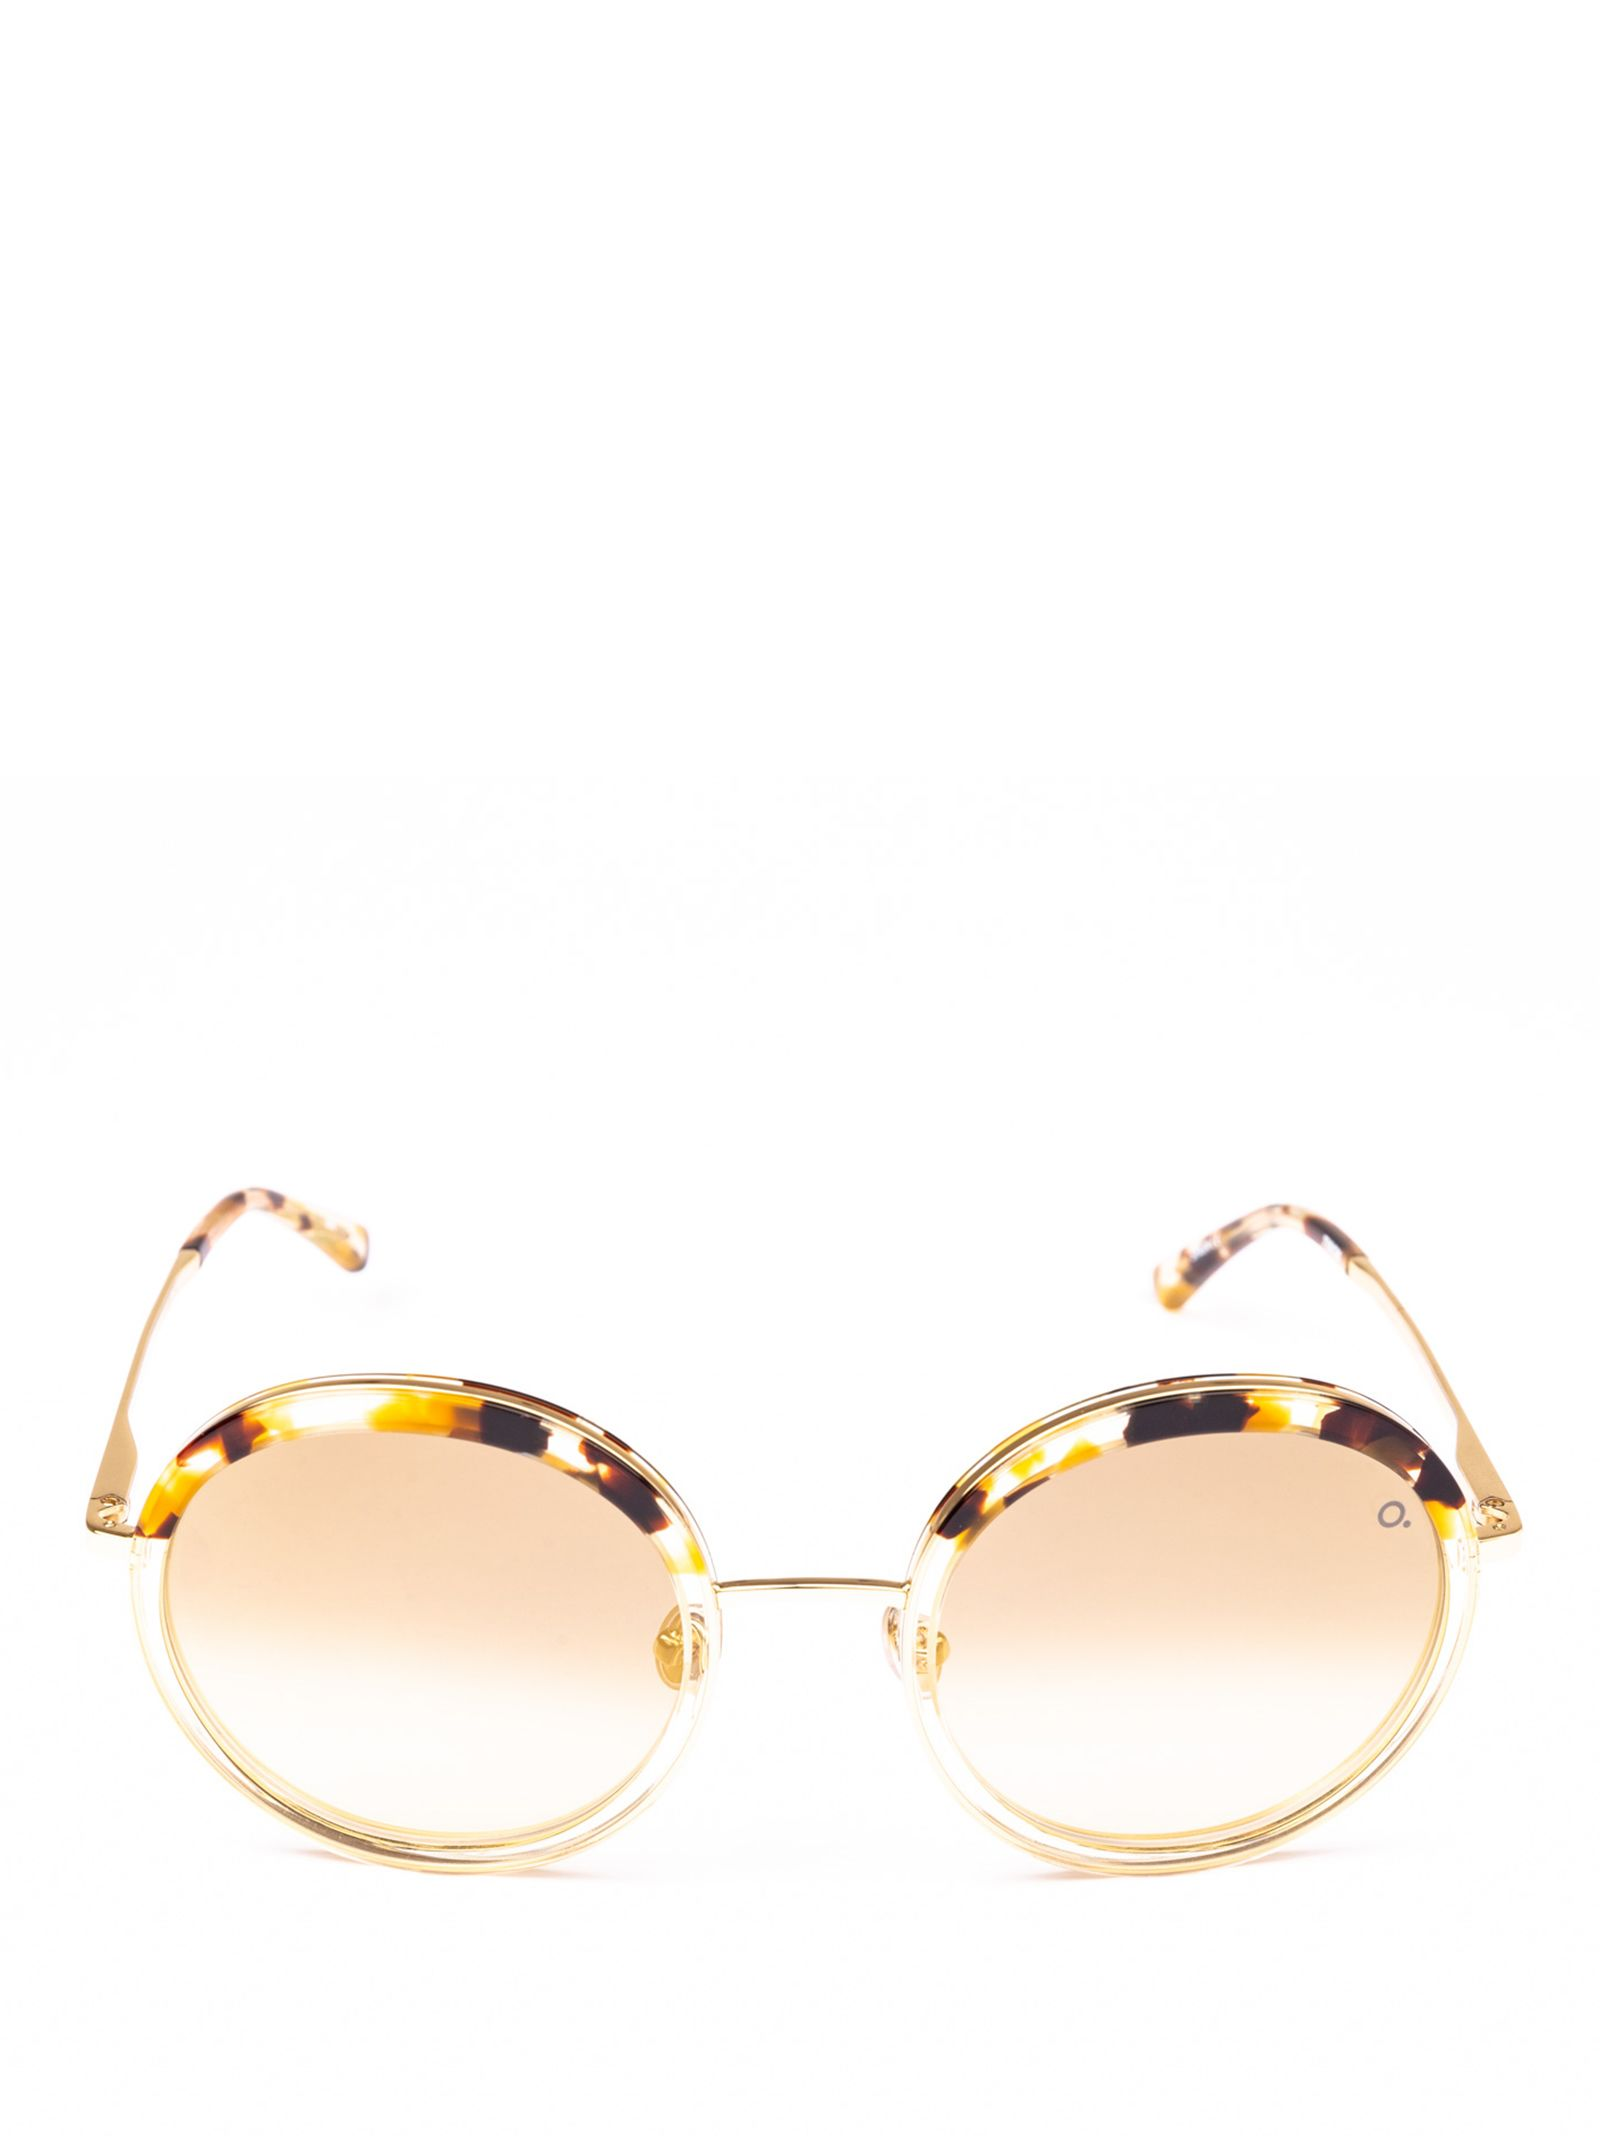 ETNIA BARCELONA Sunglasses in Clgd